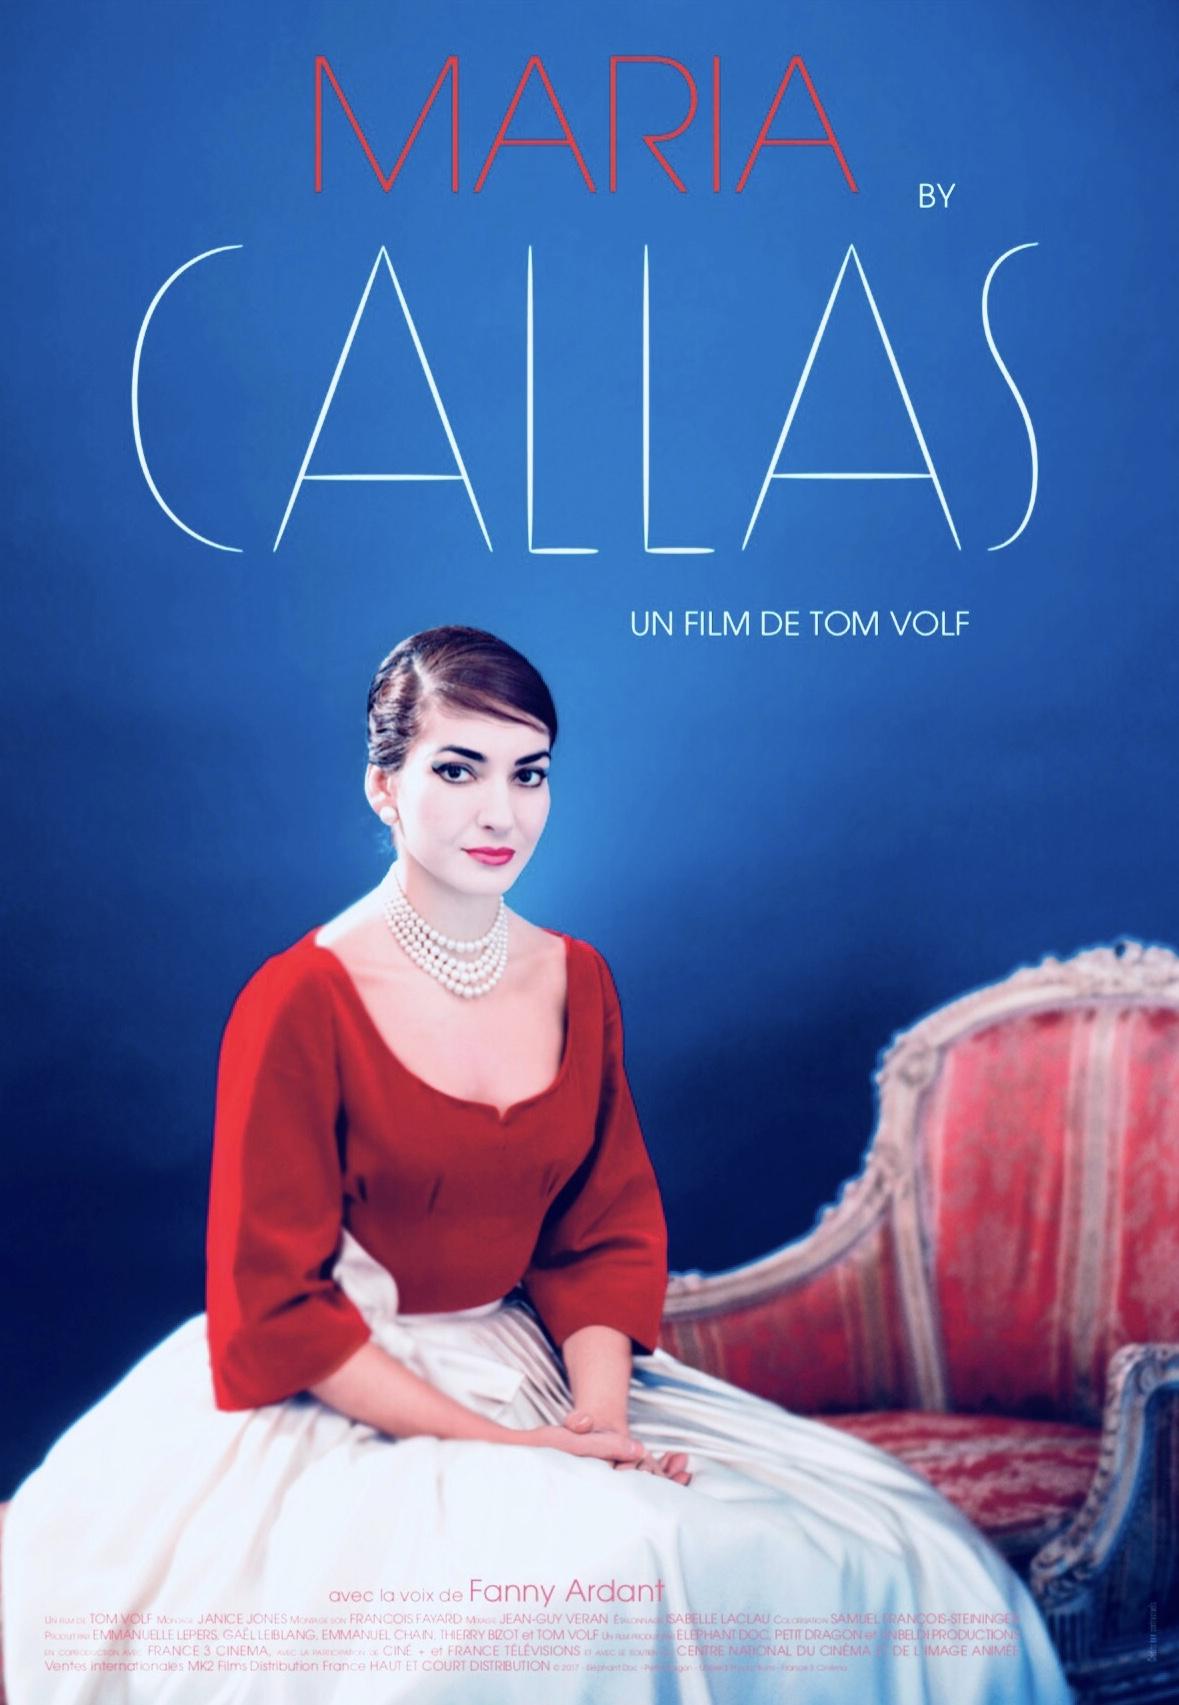 Maria by Callas kapak